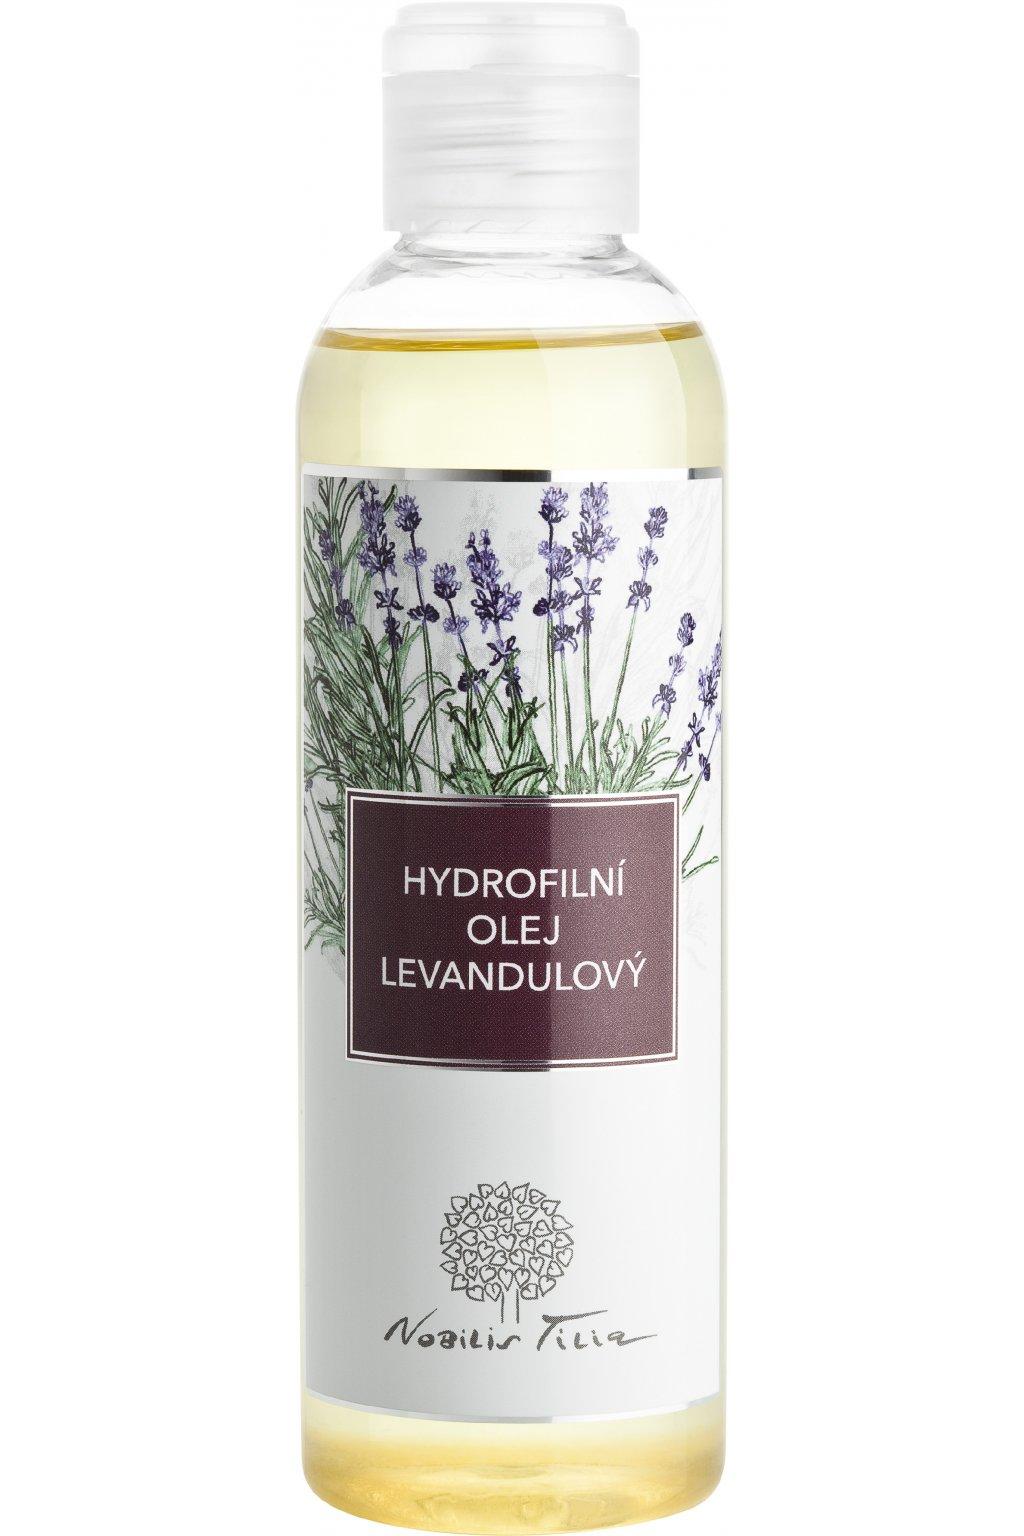 N0903I Hydrofilní olej Levandulový 200 ml